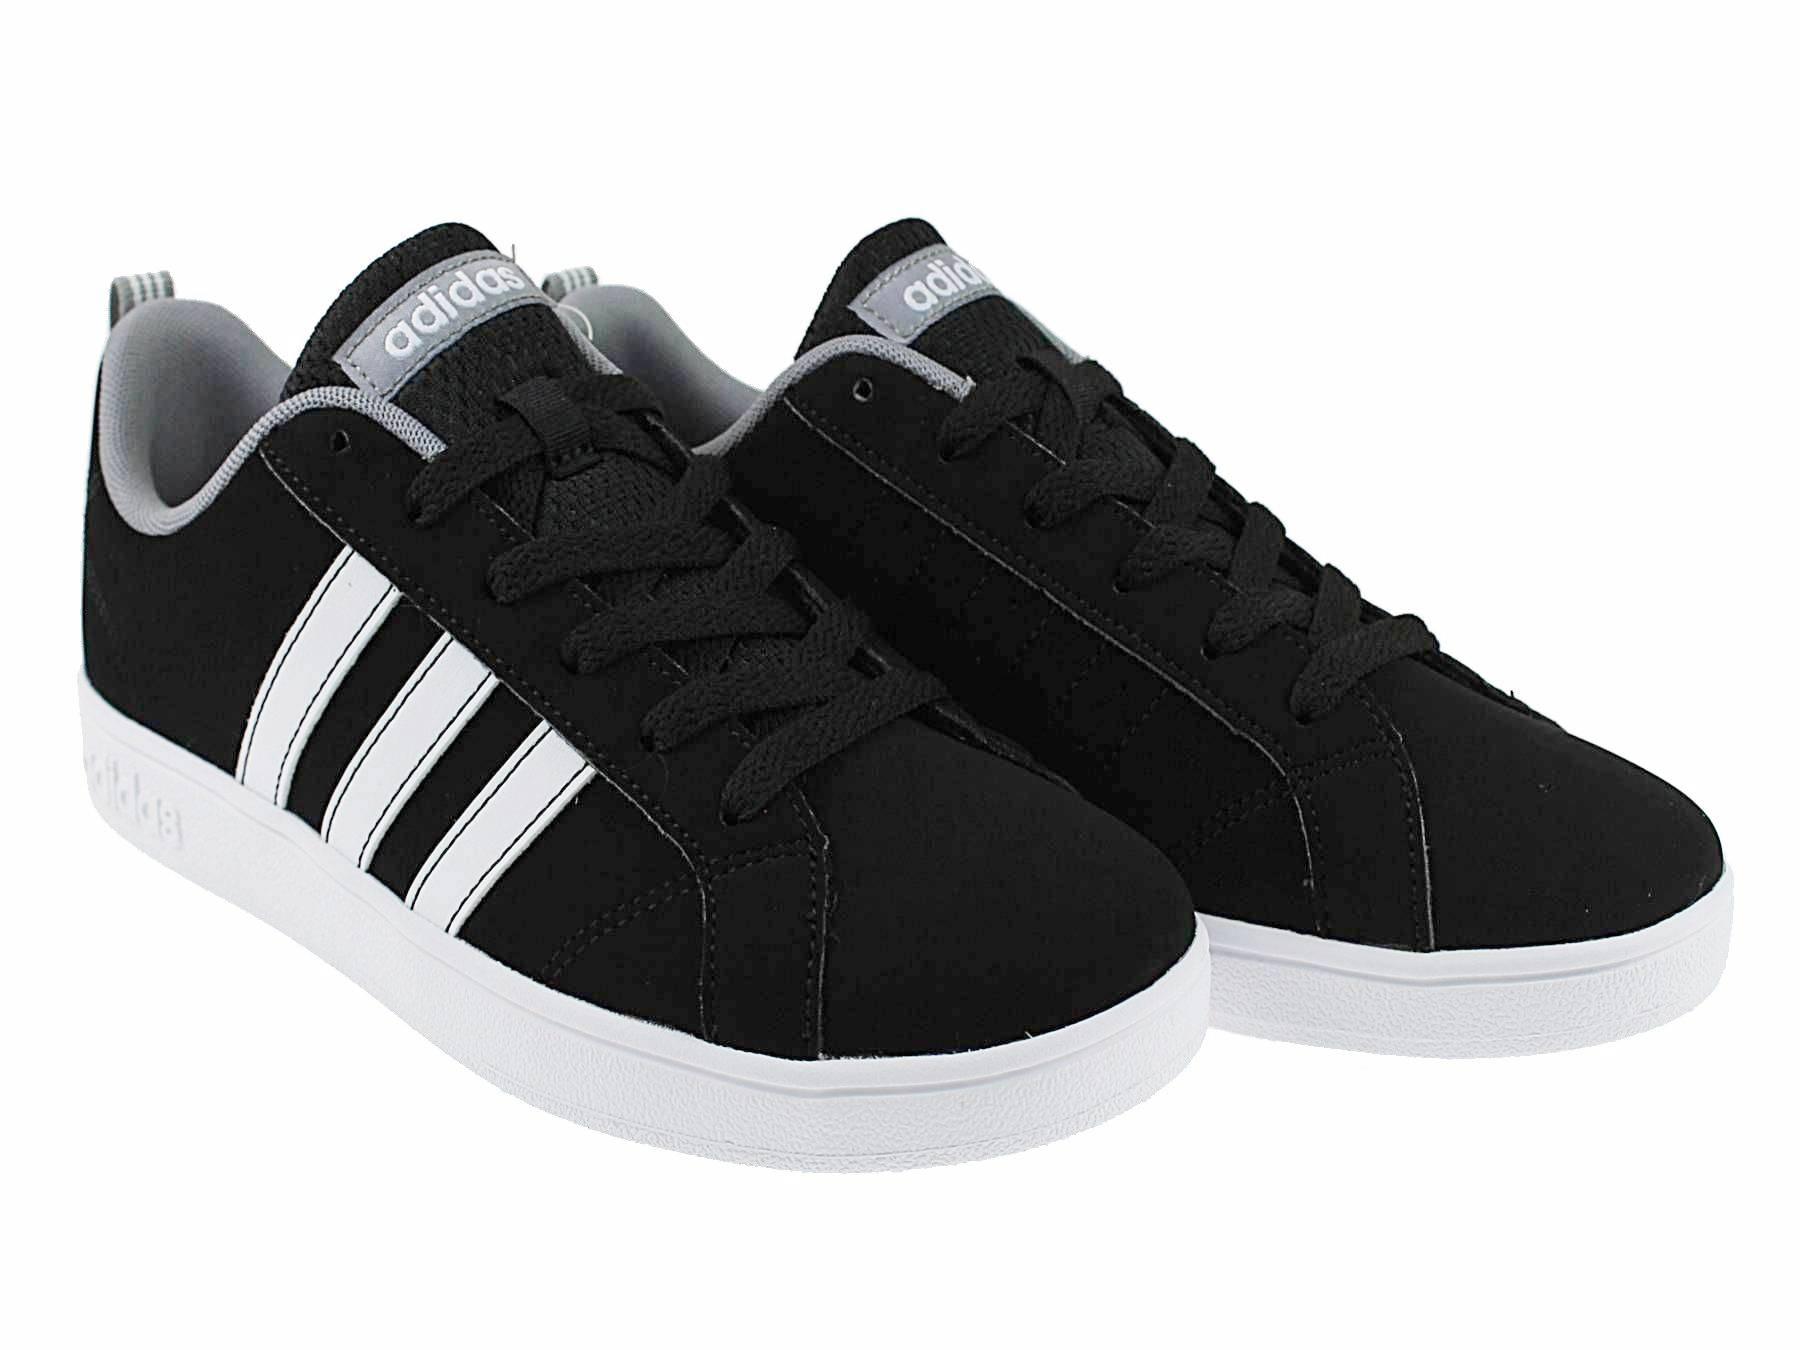 adidas Vs Advantage B74640 buty sportowe r. 38 23